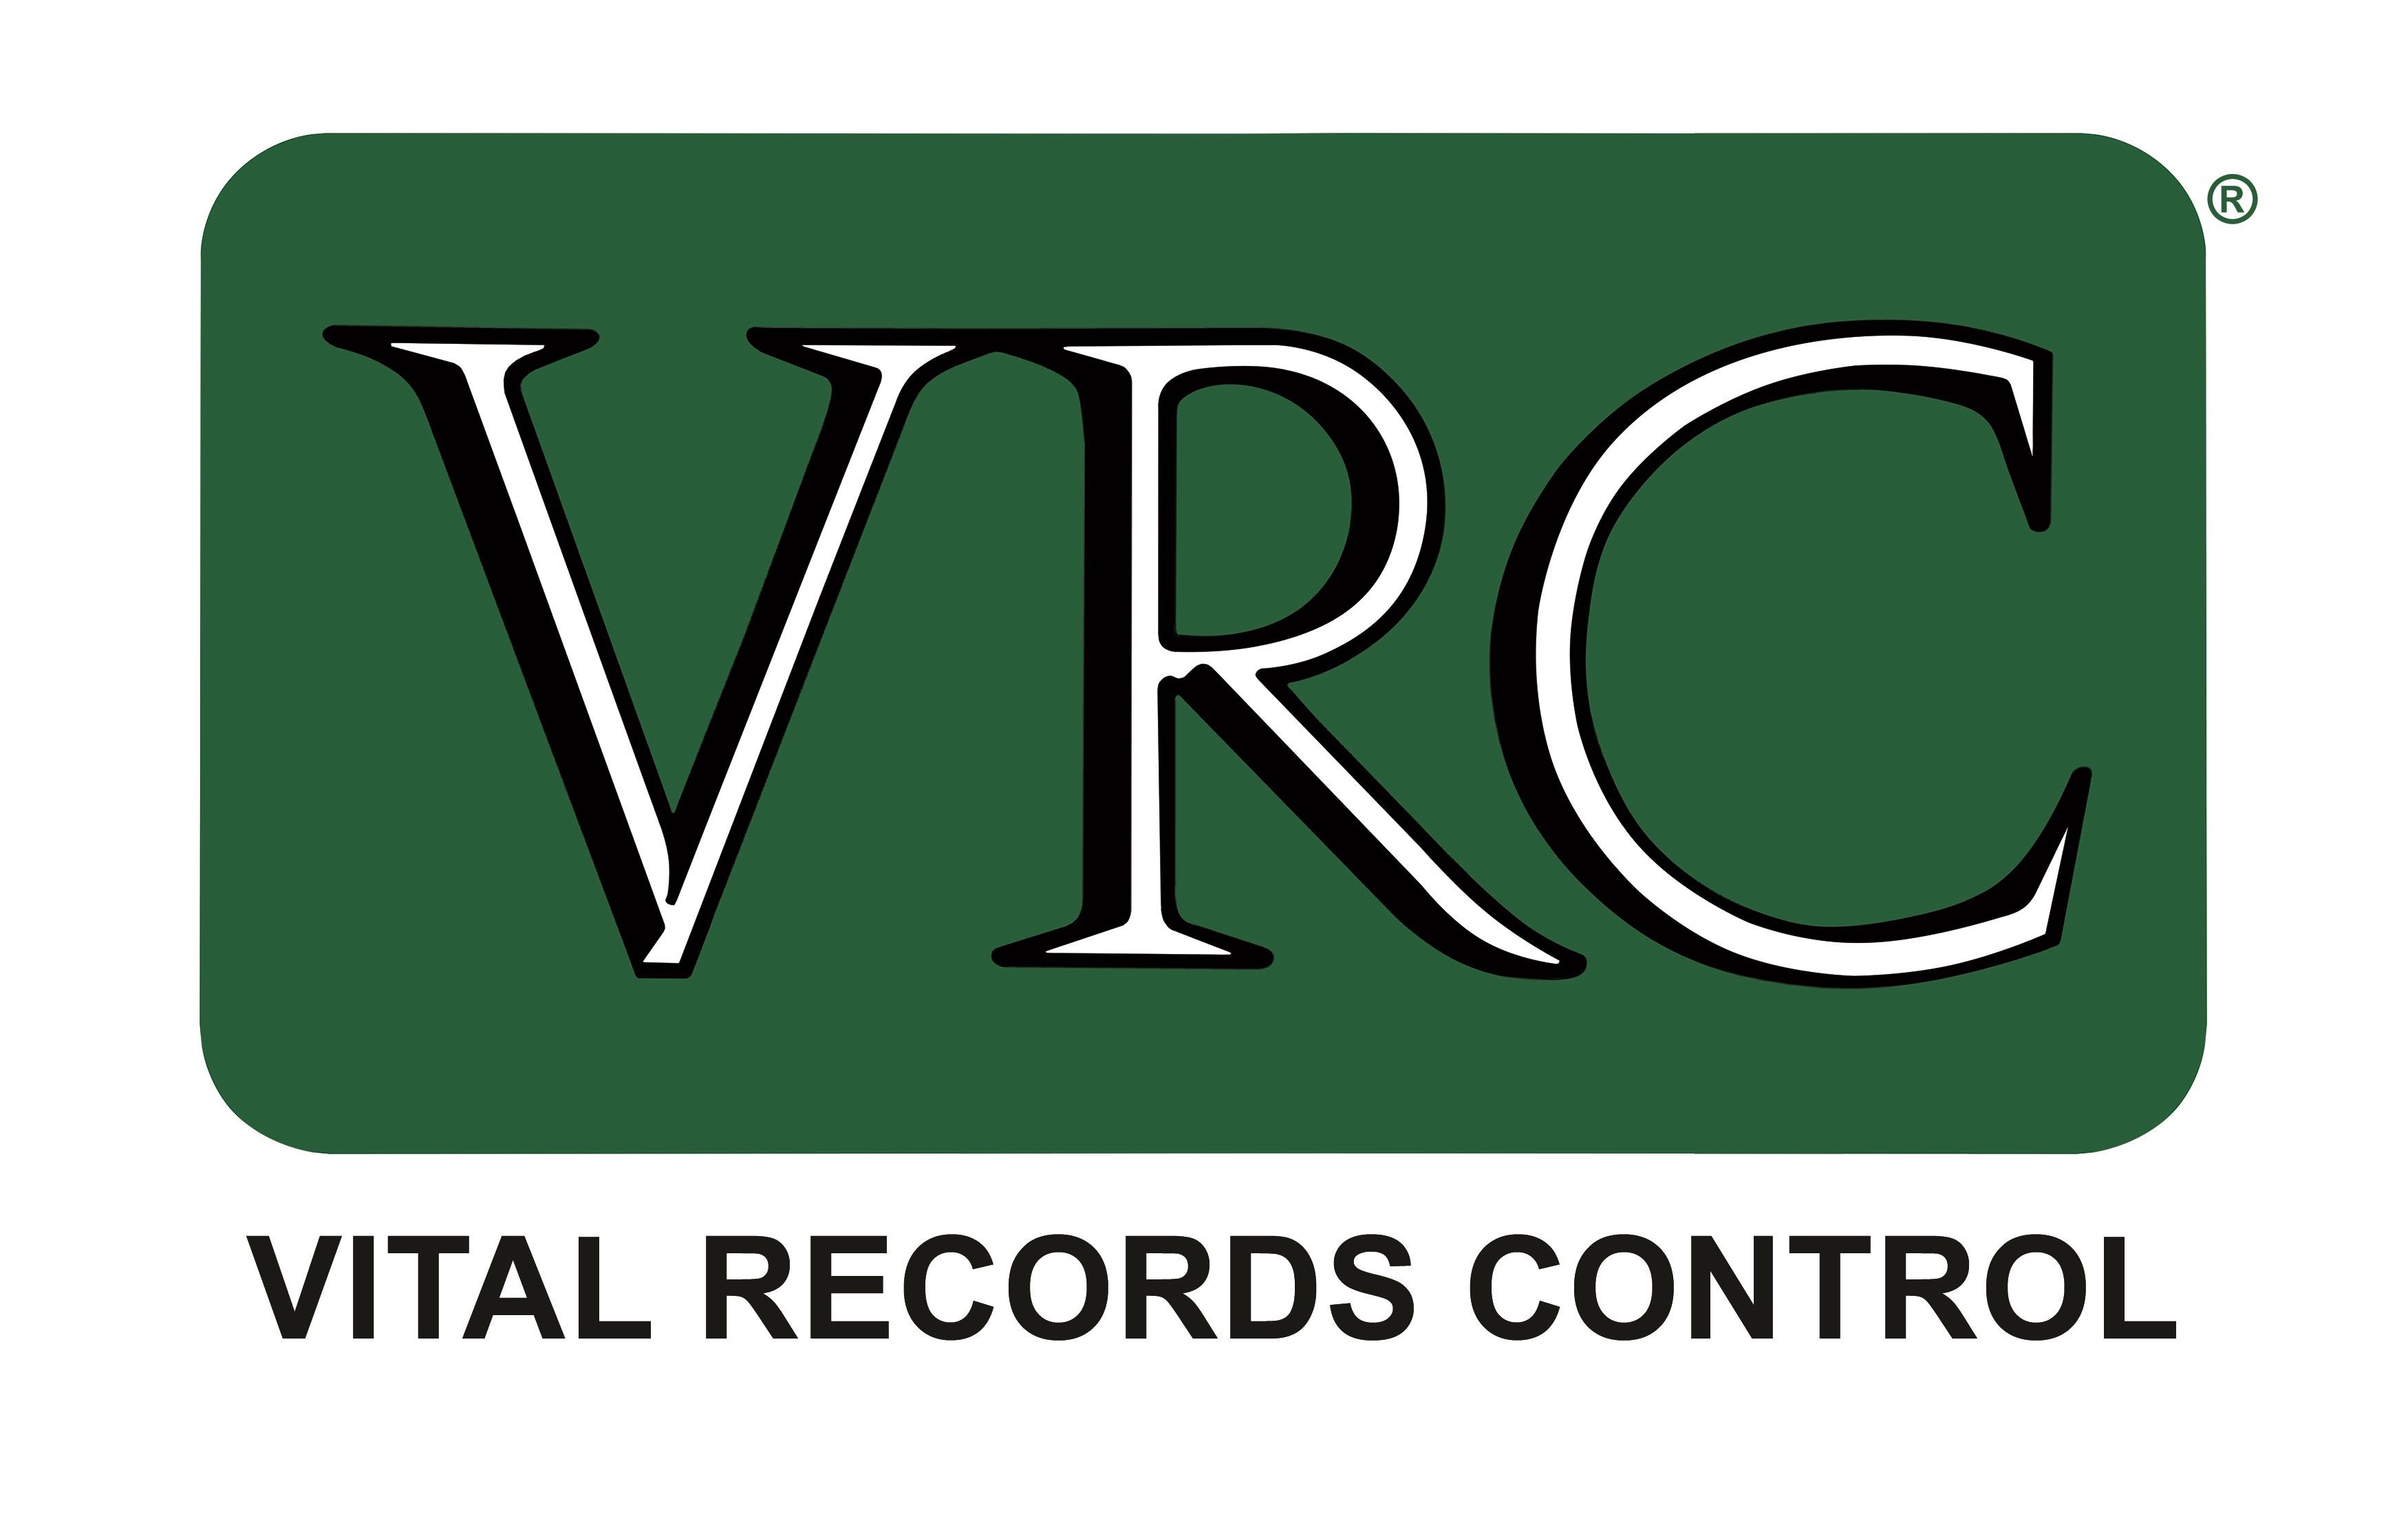 Document Management And Storage Shredding Vital Records Control